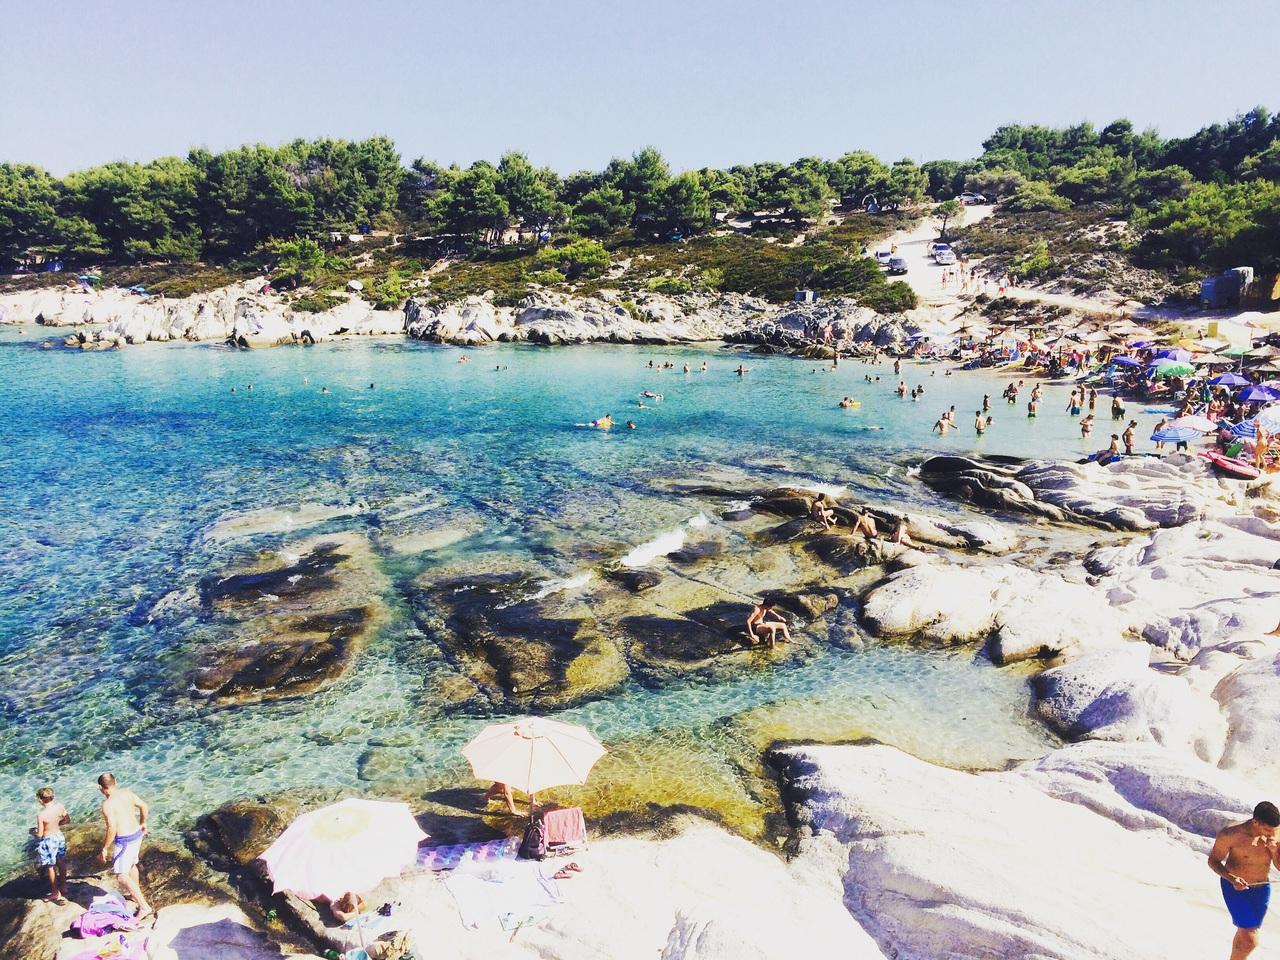 Greece, Ελλάδα, and χαλκιδικη image